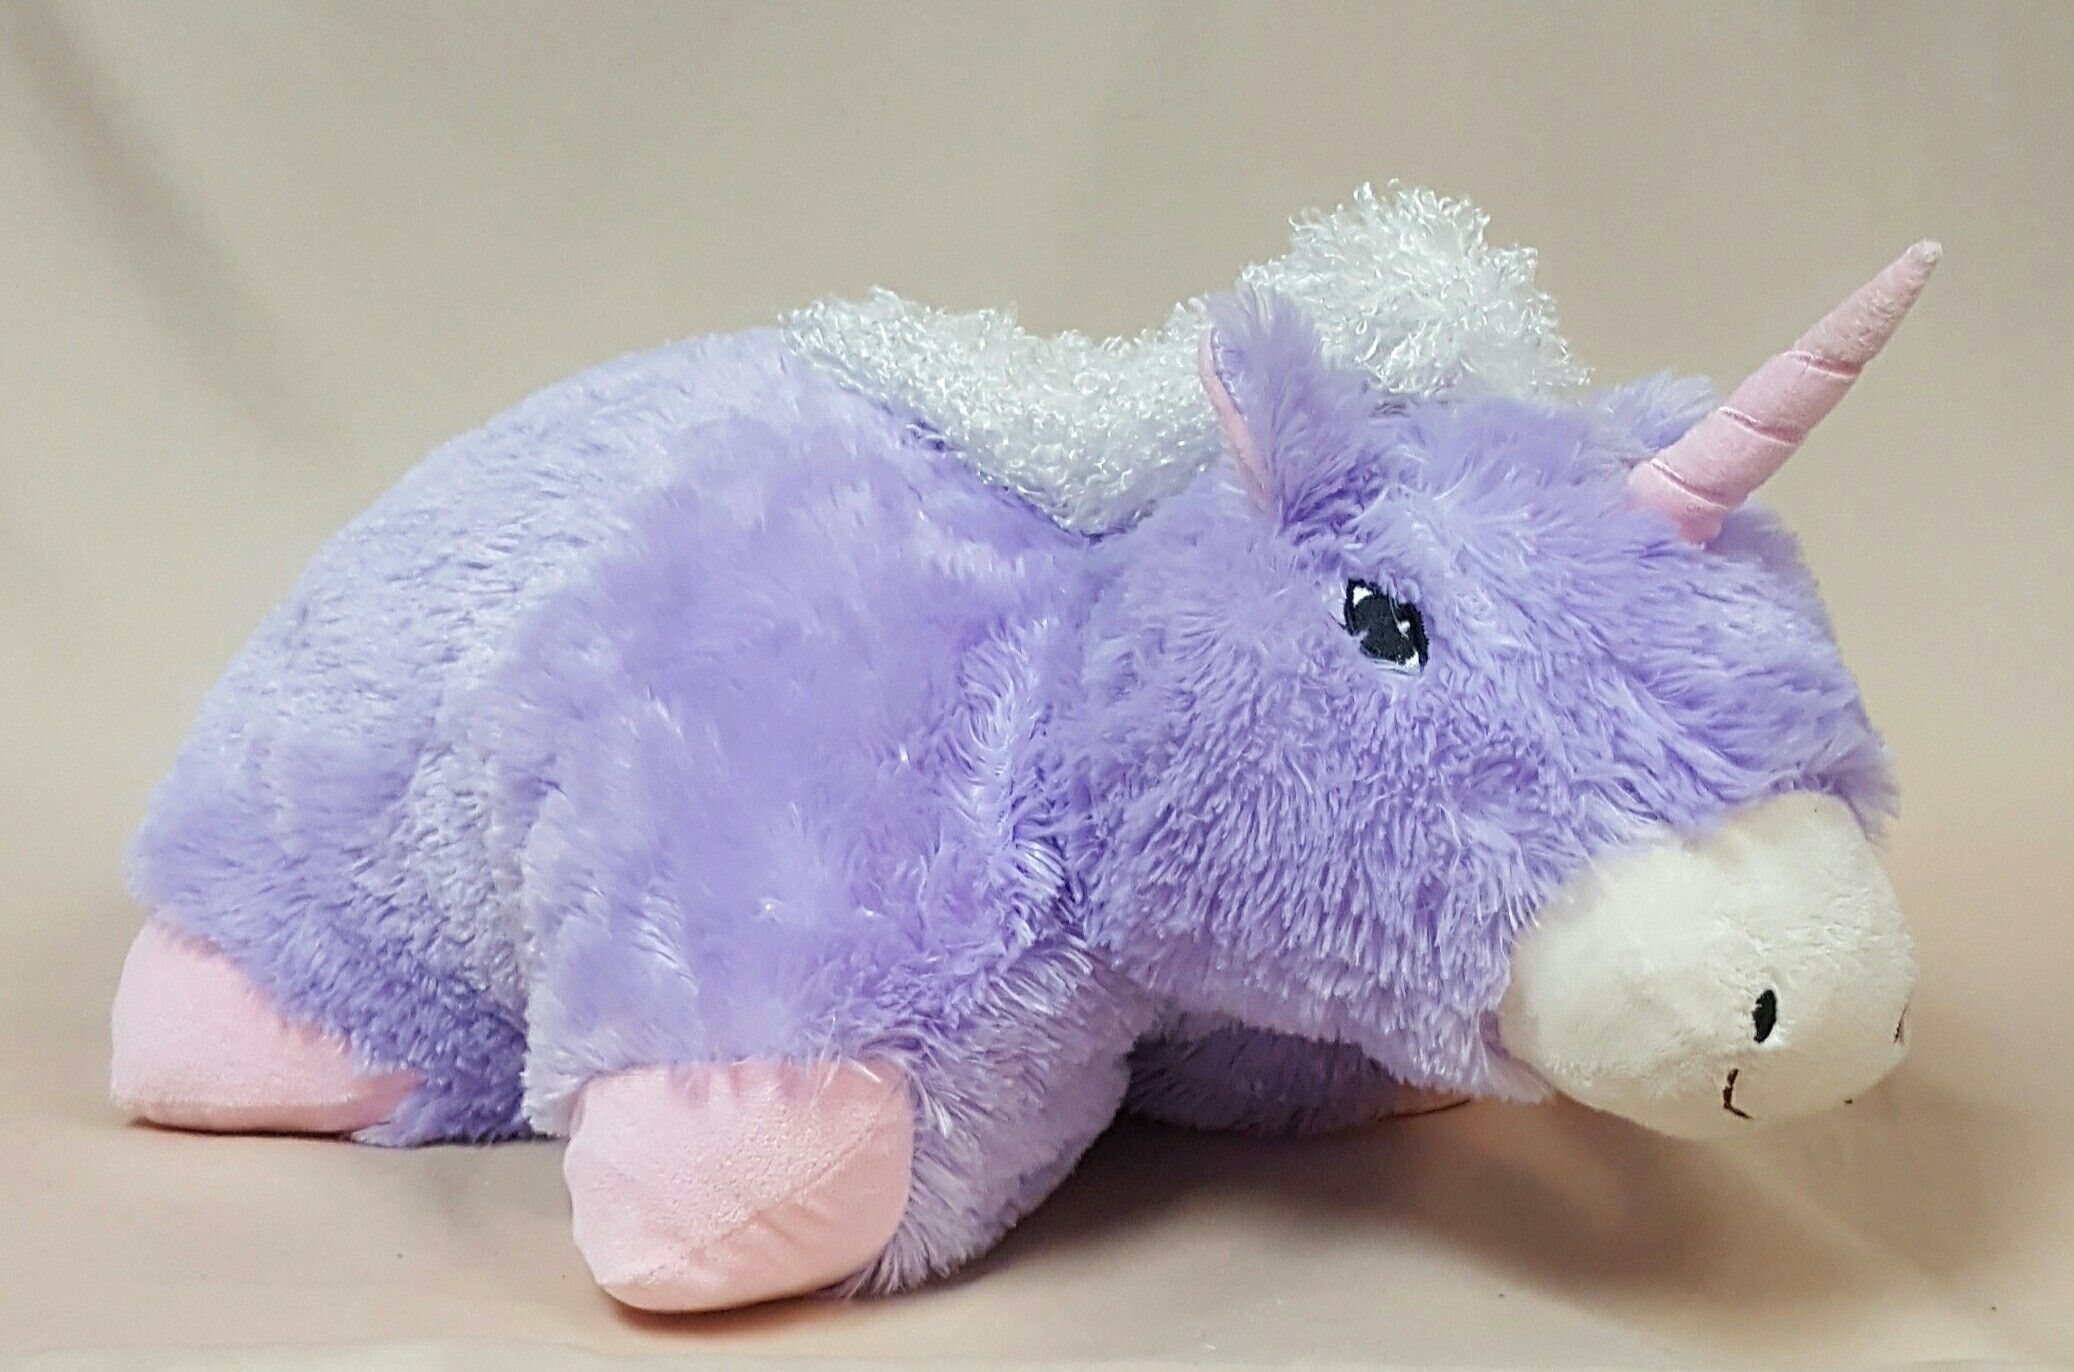 Pillow Pet unicorn, soft plush Animal pillows